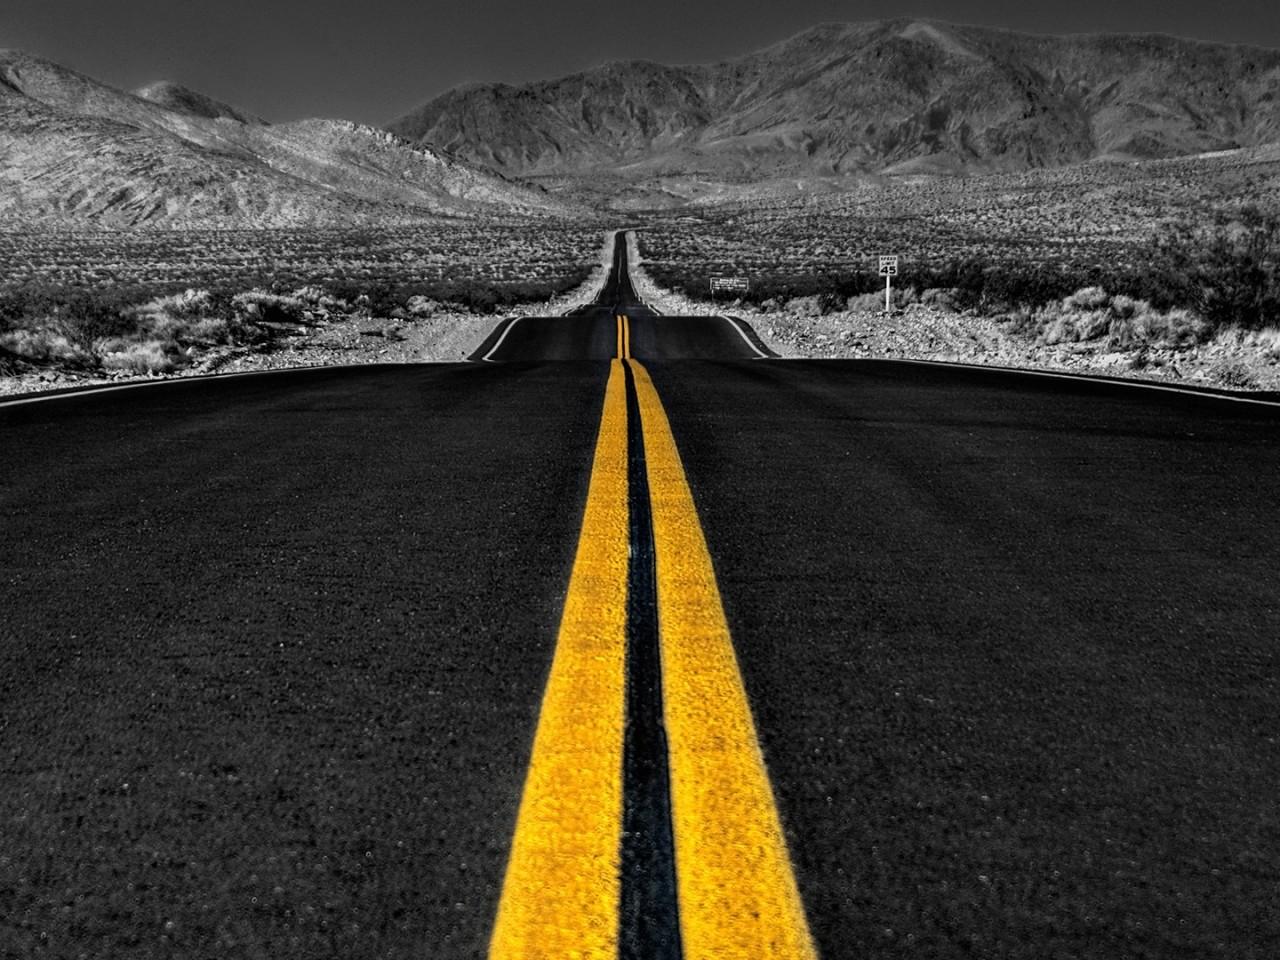 Long road wallpaper - HD Wallpapers